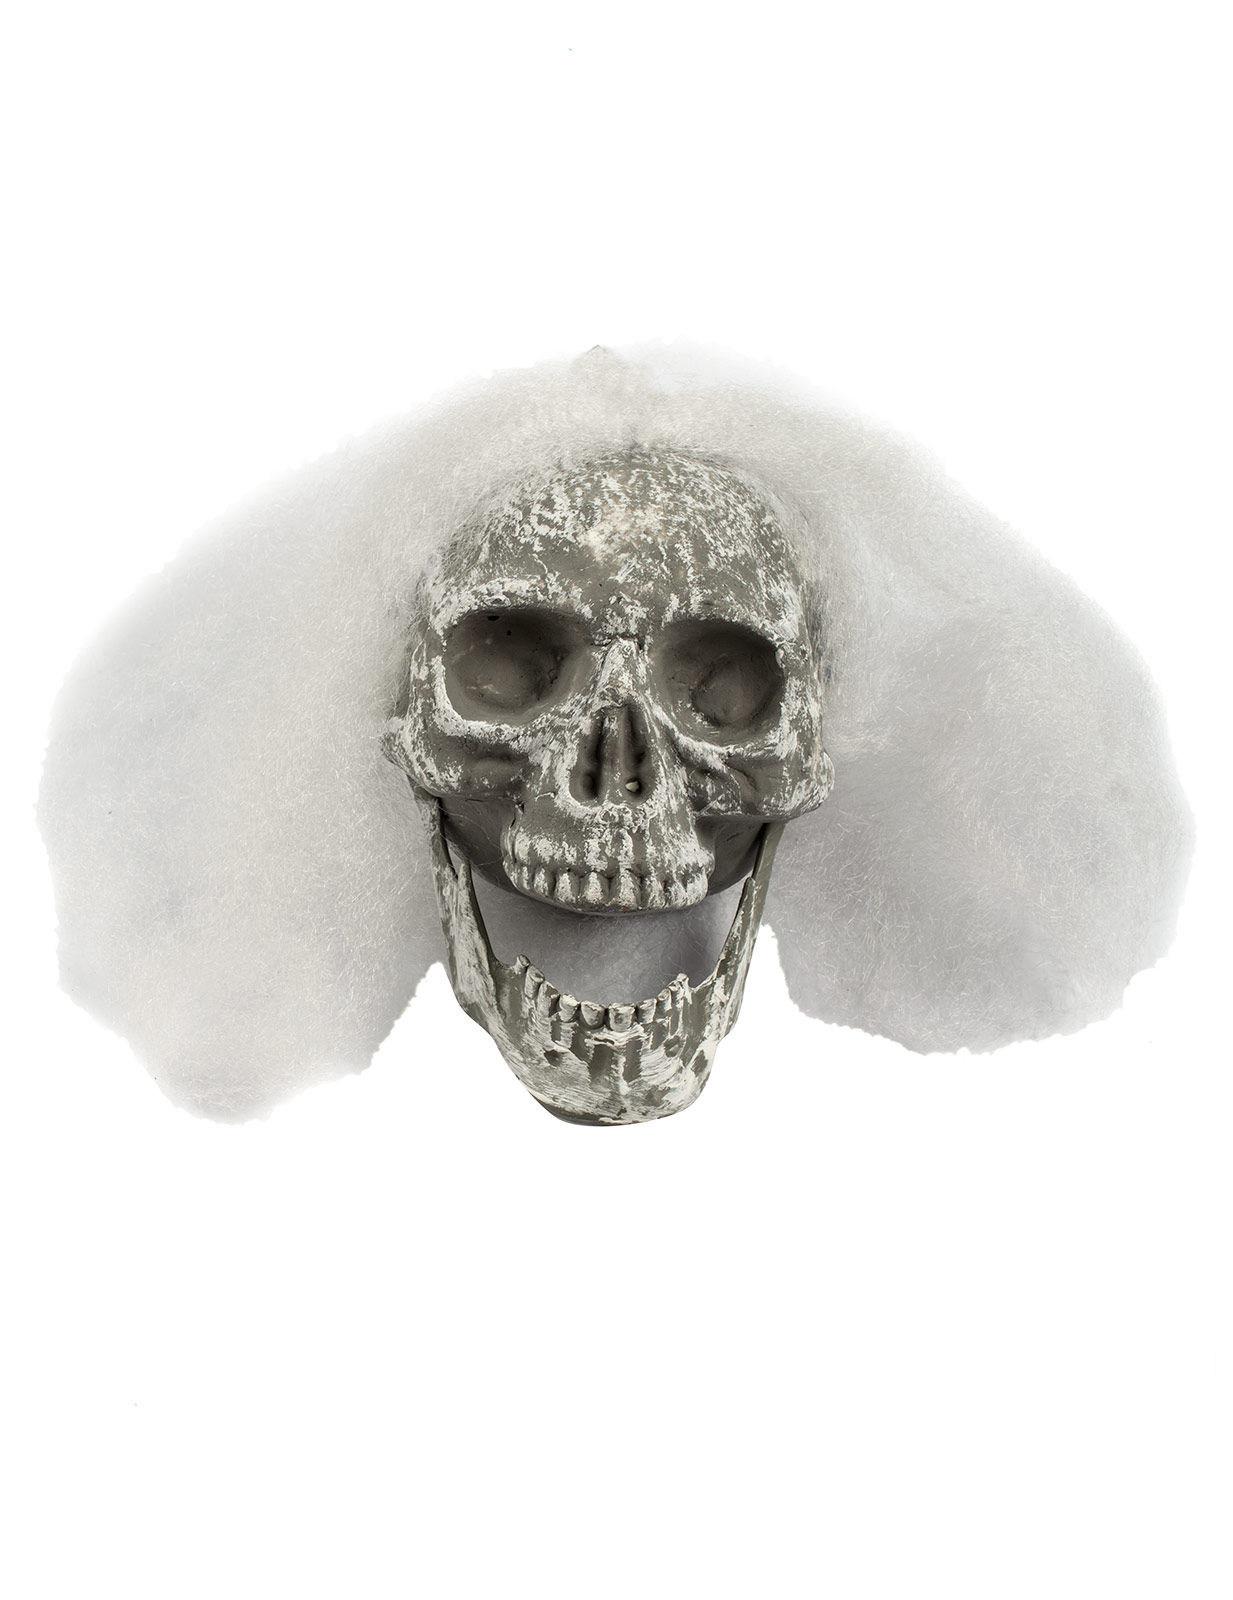 skelett sch del halloween deko weiss 23x14x11cm g nstige. Black Bedroom Furniture Sets. Home Design Ideas